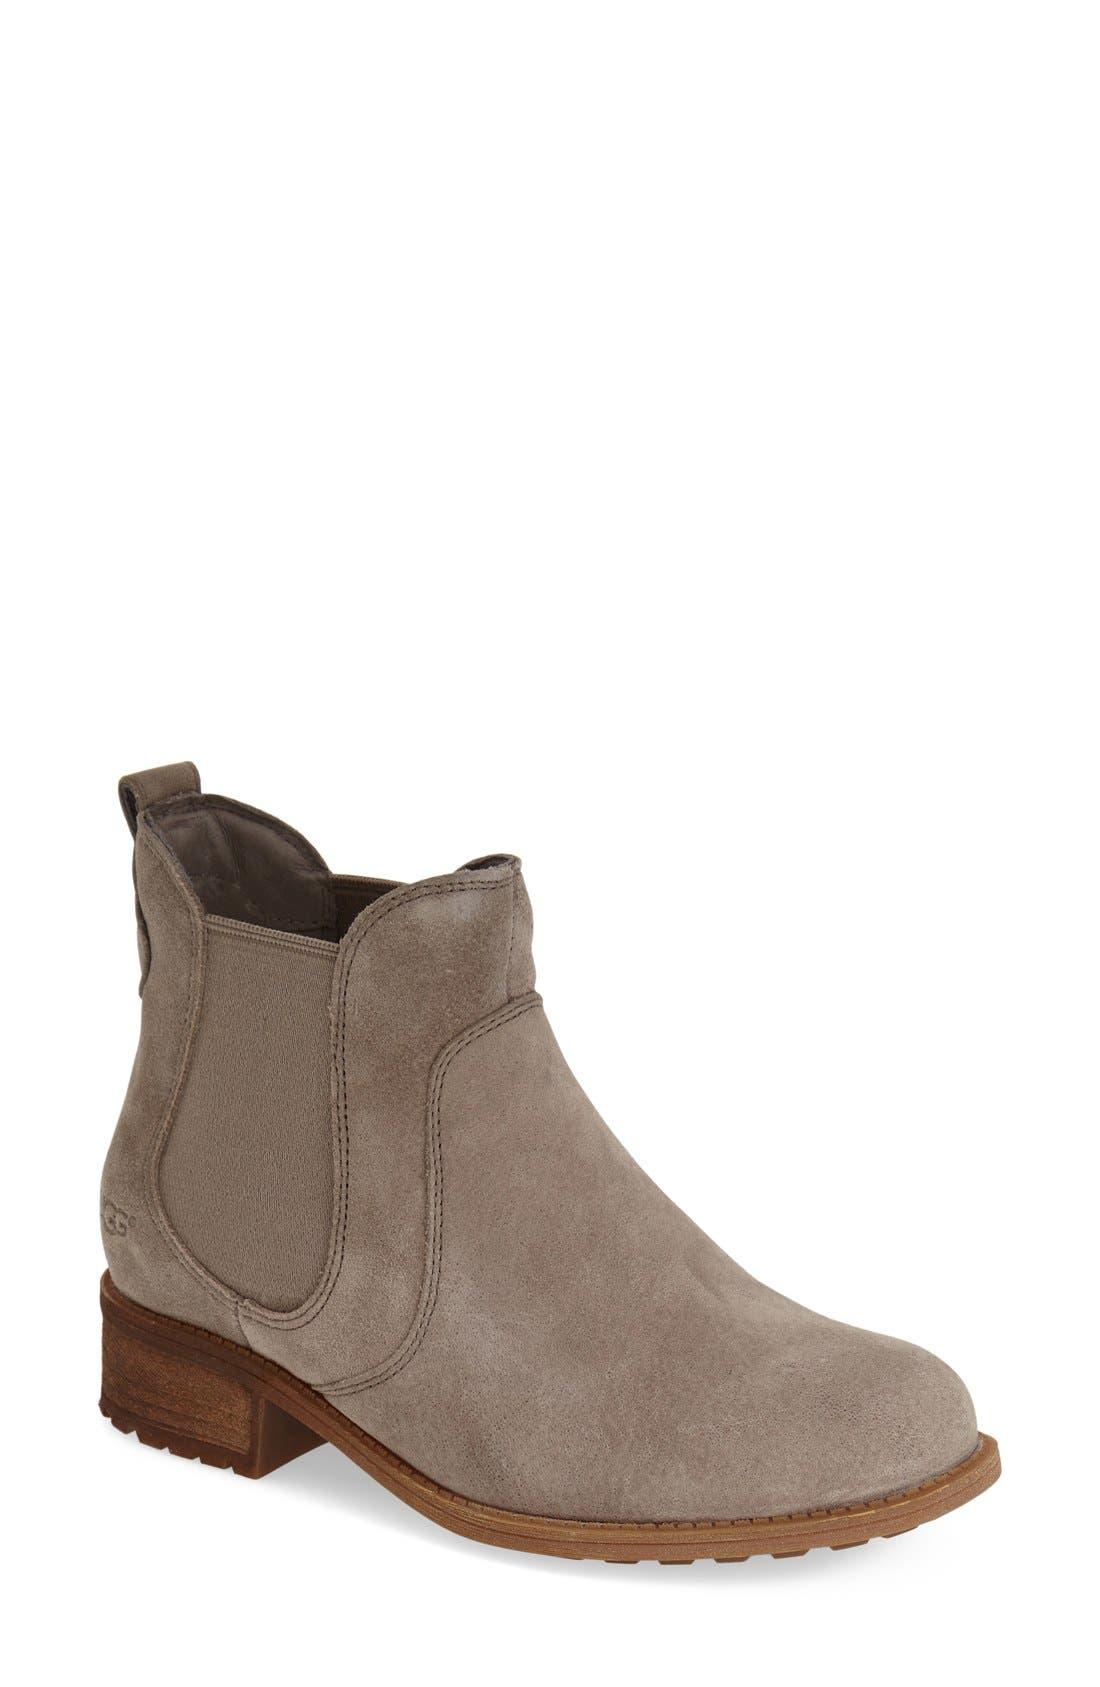 Main Image - UGG® Bonham Chelsea Boot (Women)